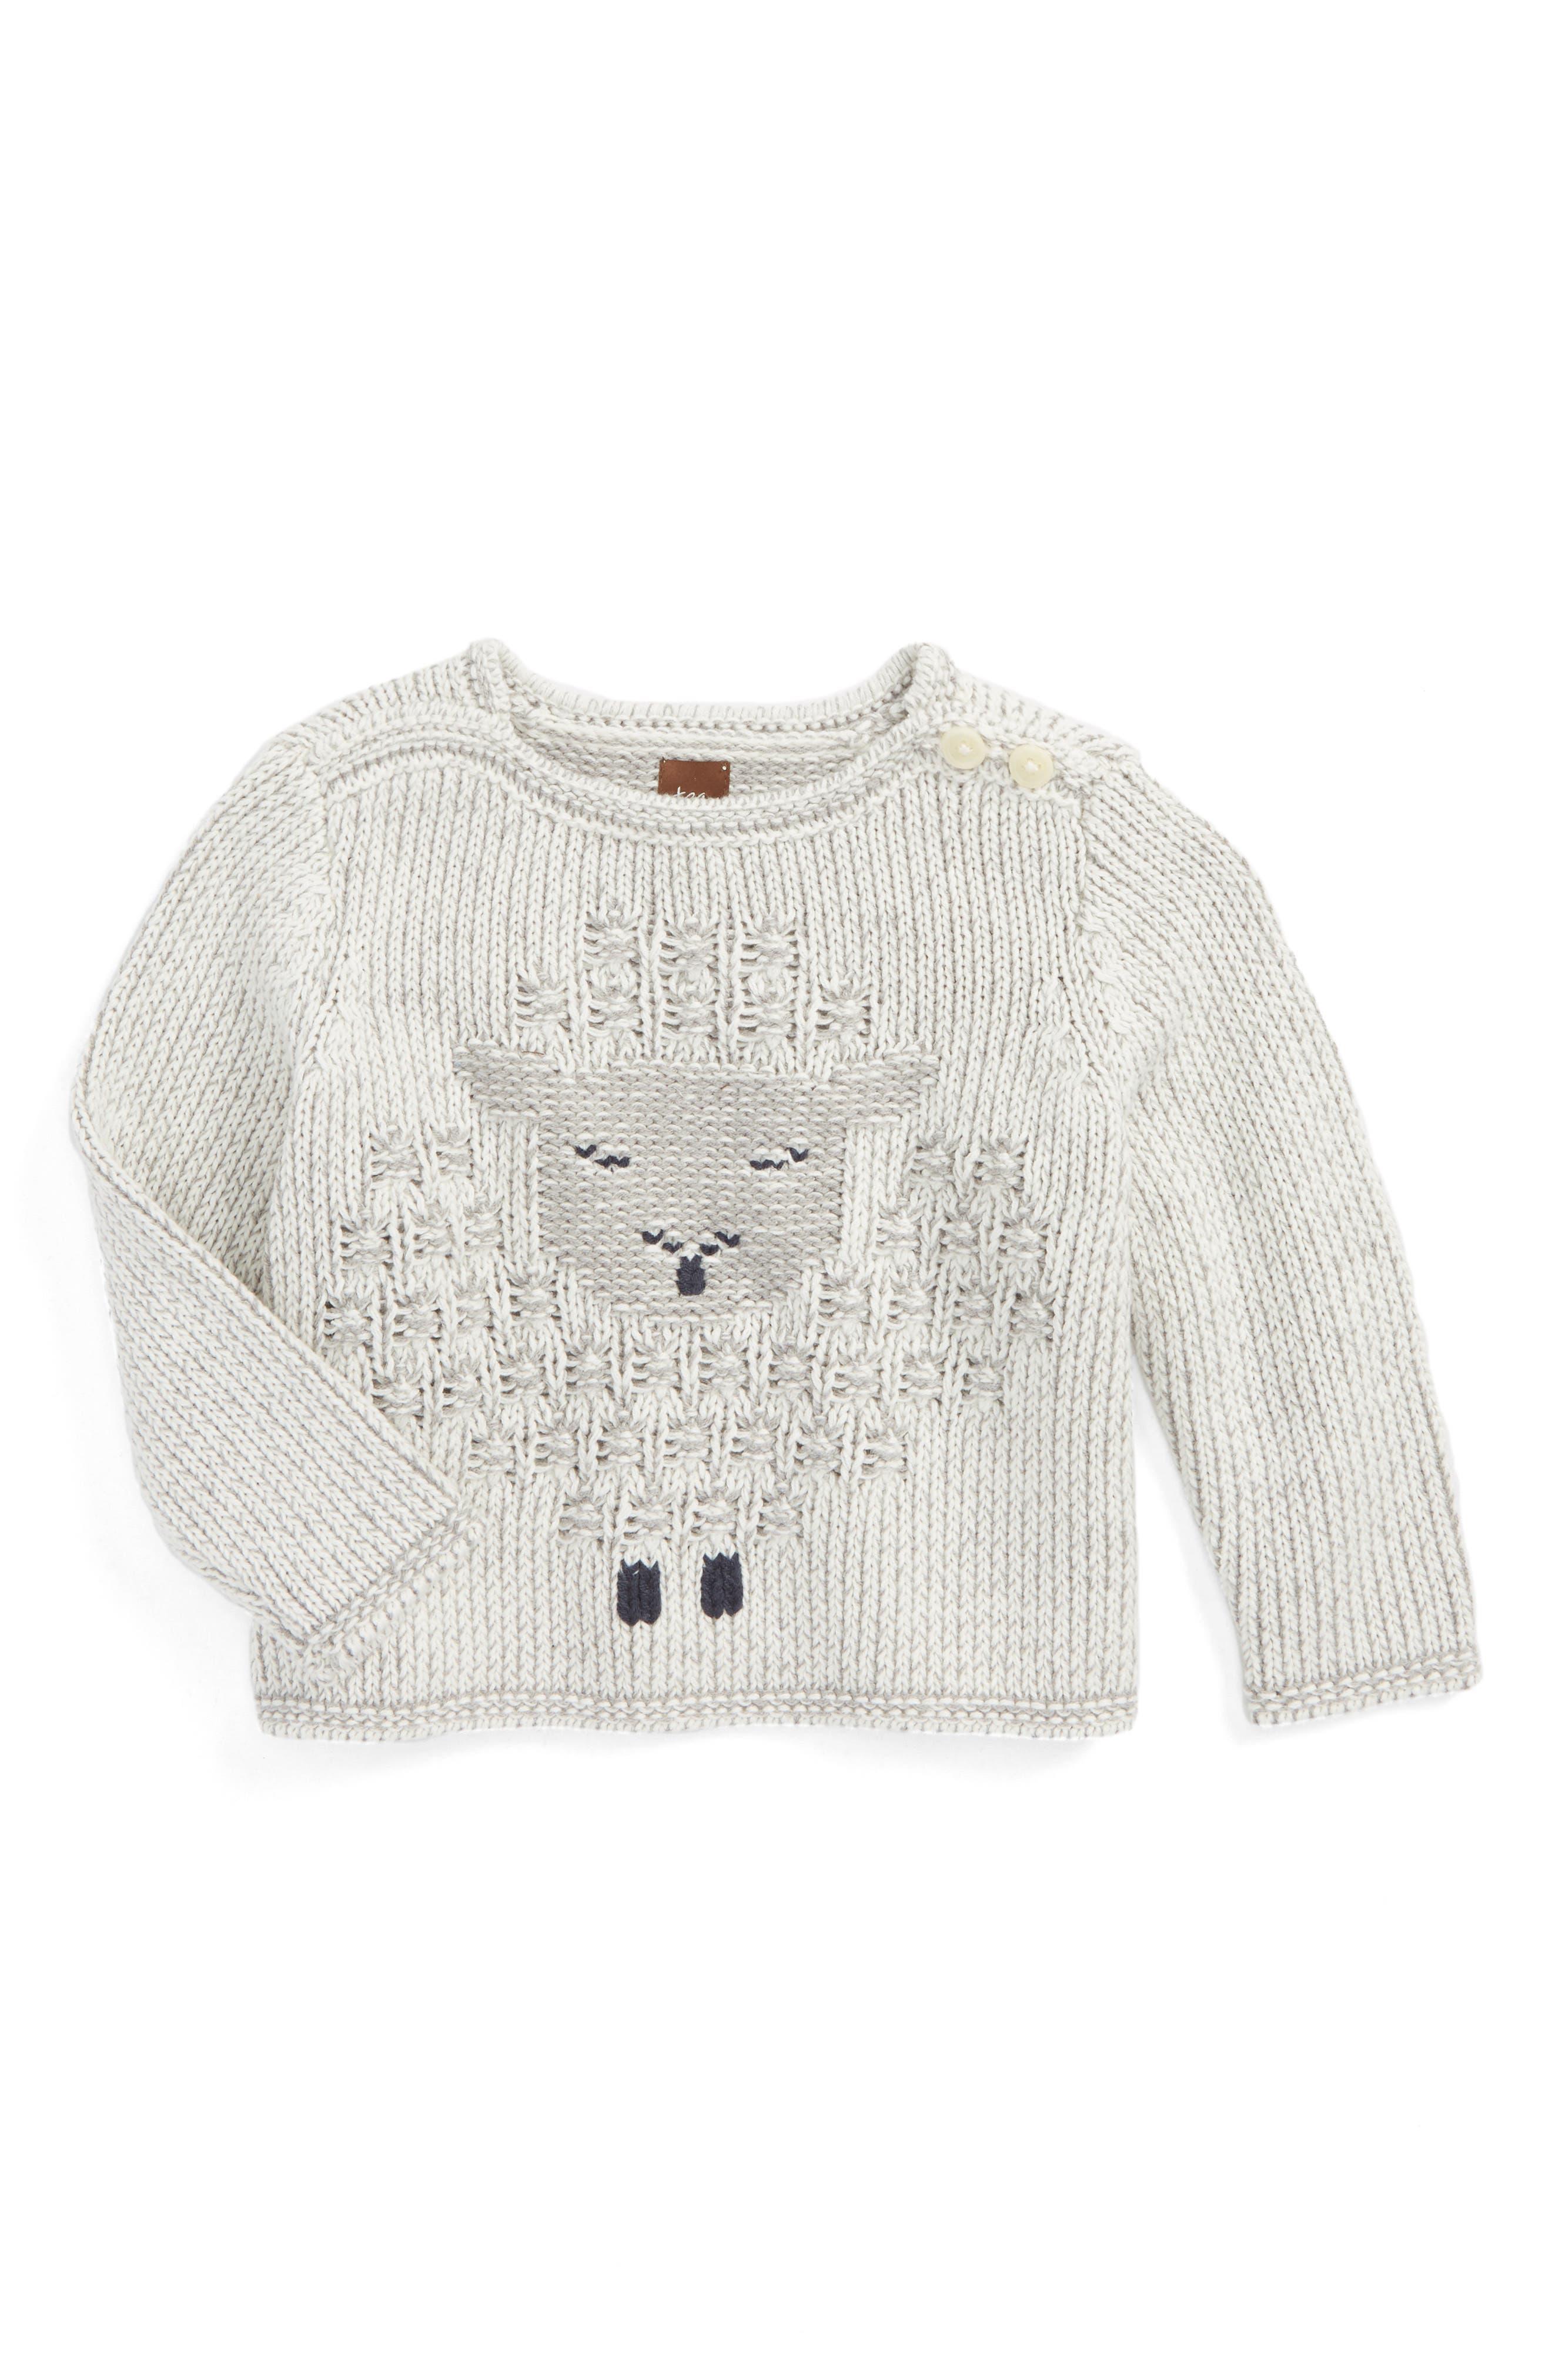 Tea Collection Uan Sweater (Toddler Girls)